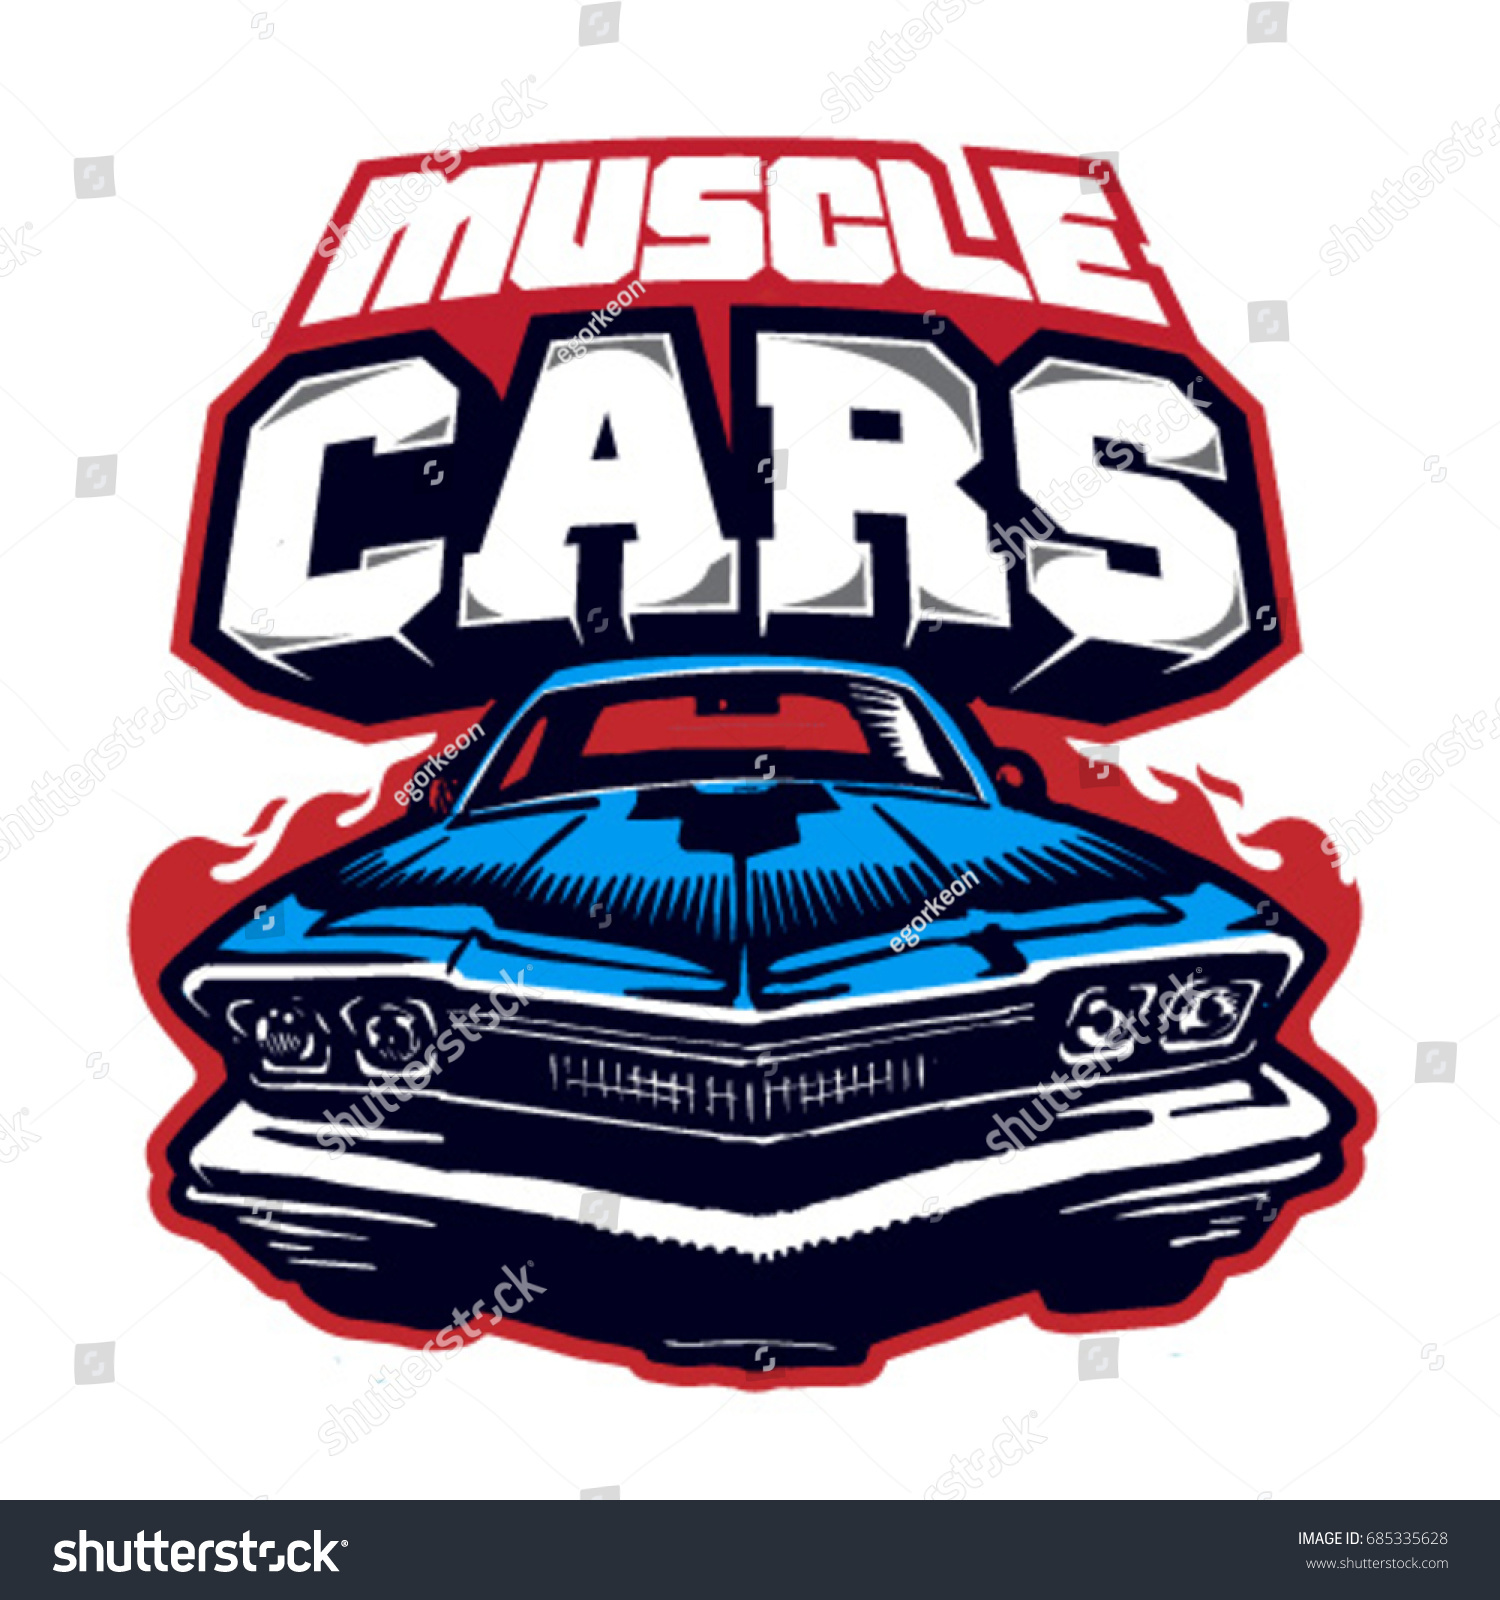 Muscle car logo vector isolated stock vector 685335628 shutterstock muscle car logo vector isolated biocorpaavc